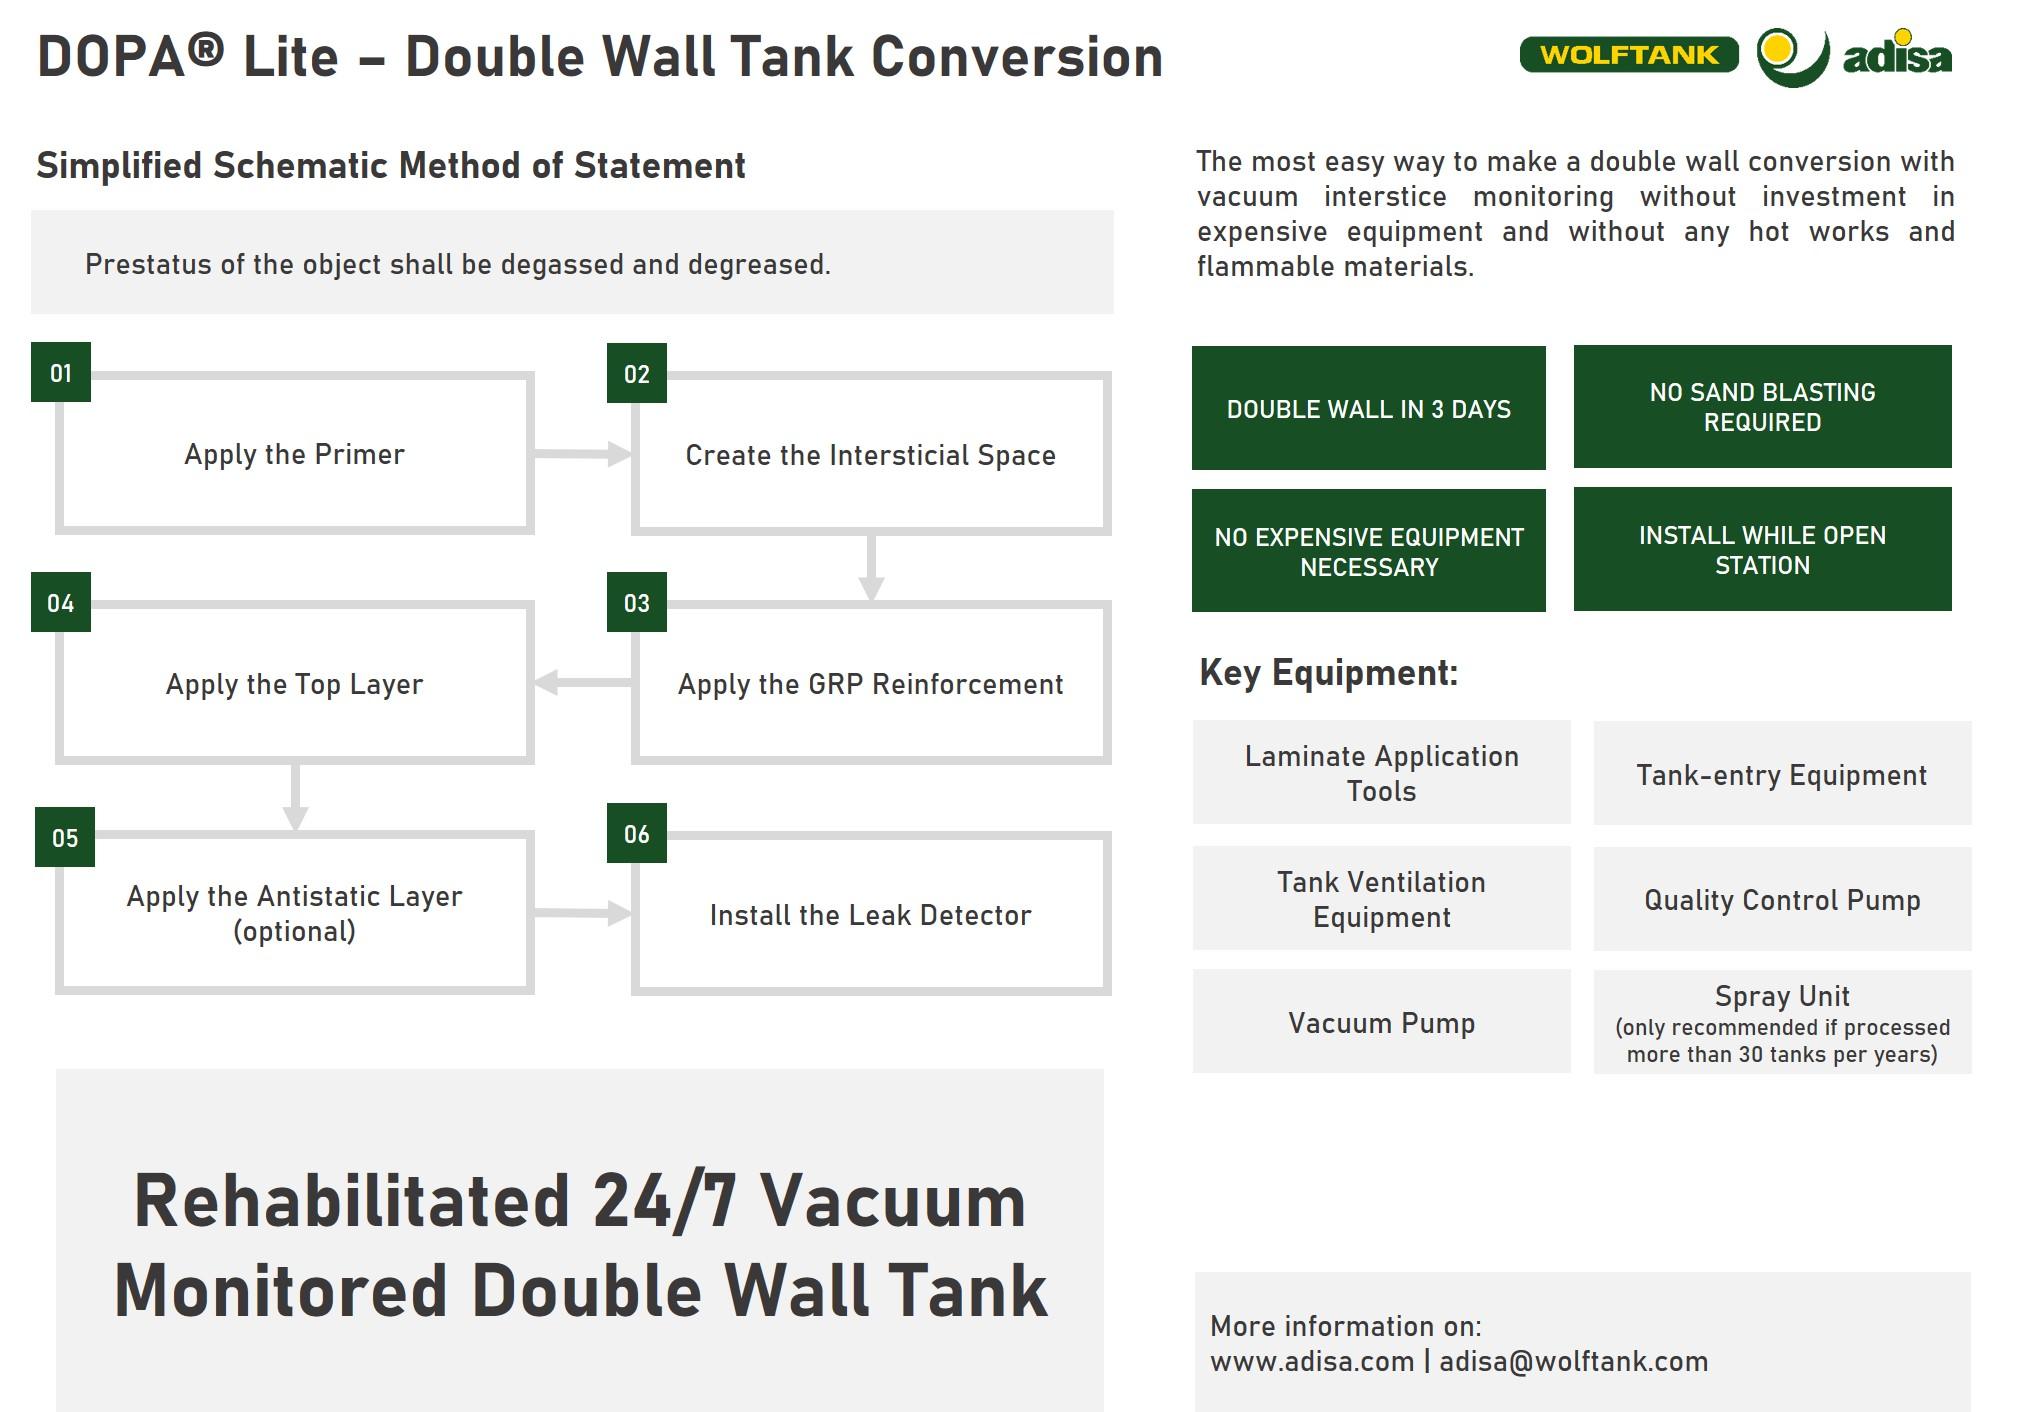 DOPA Lite Double Wall Conversion Simple Method Statement - Wolftank Adisa